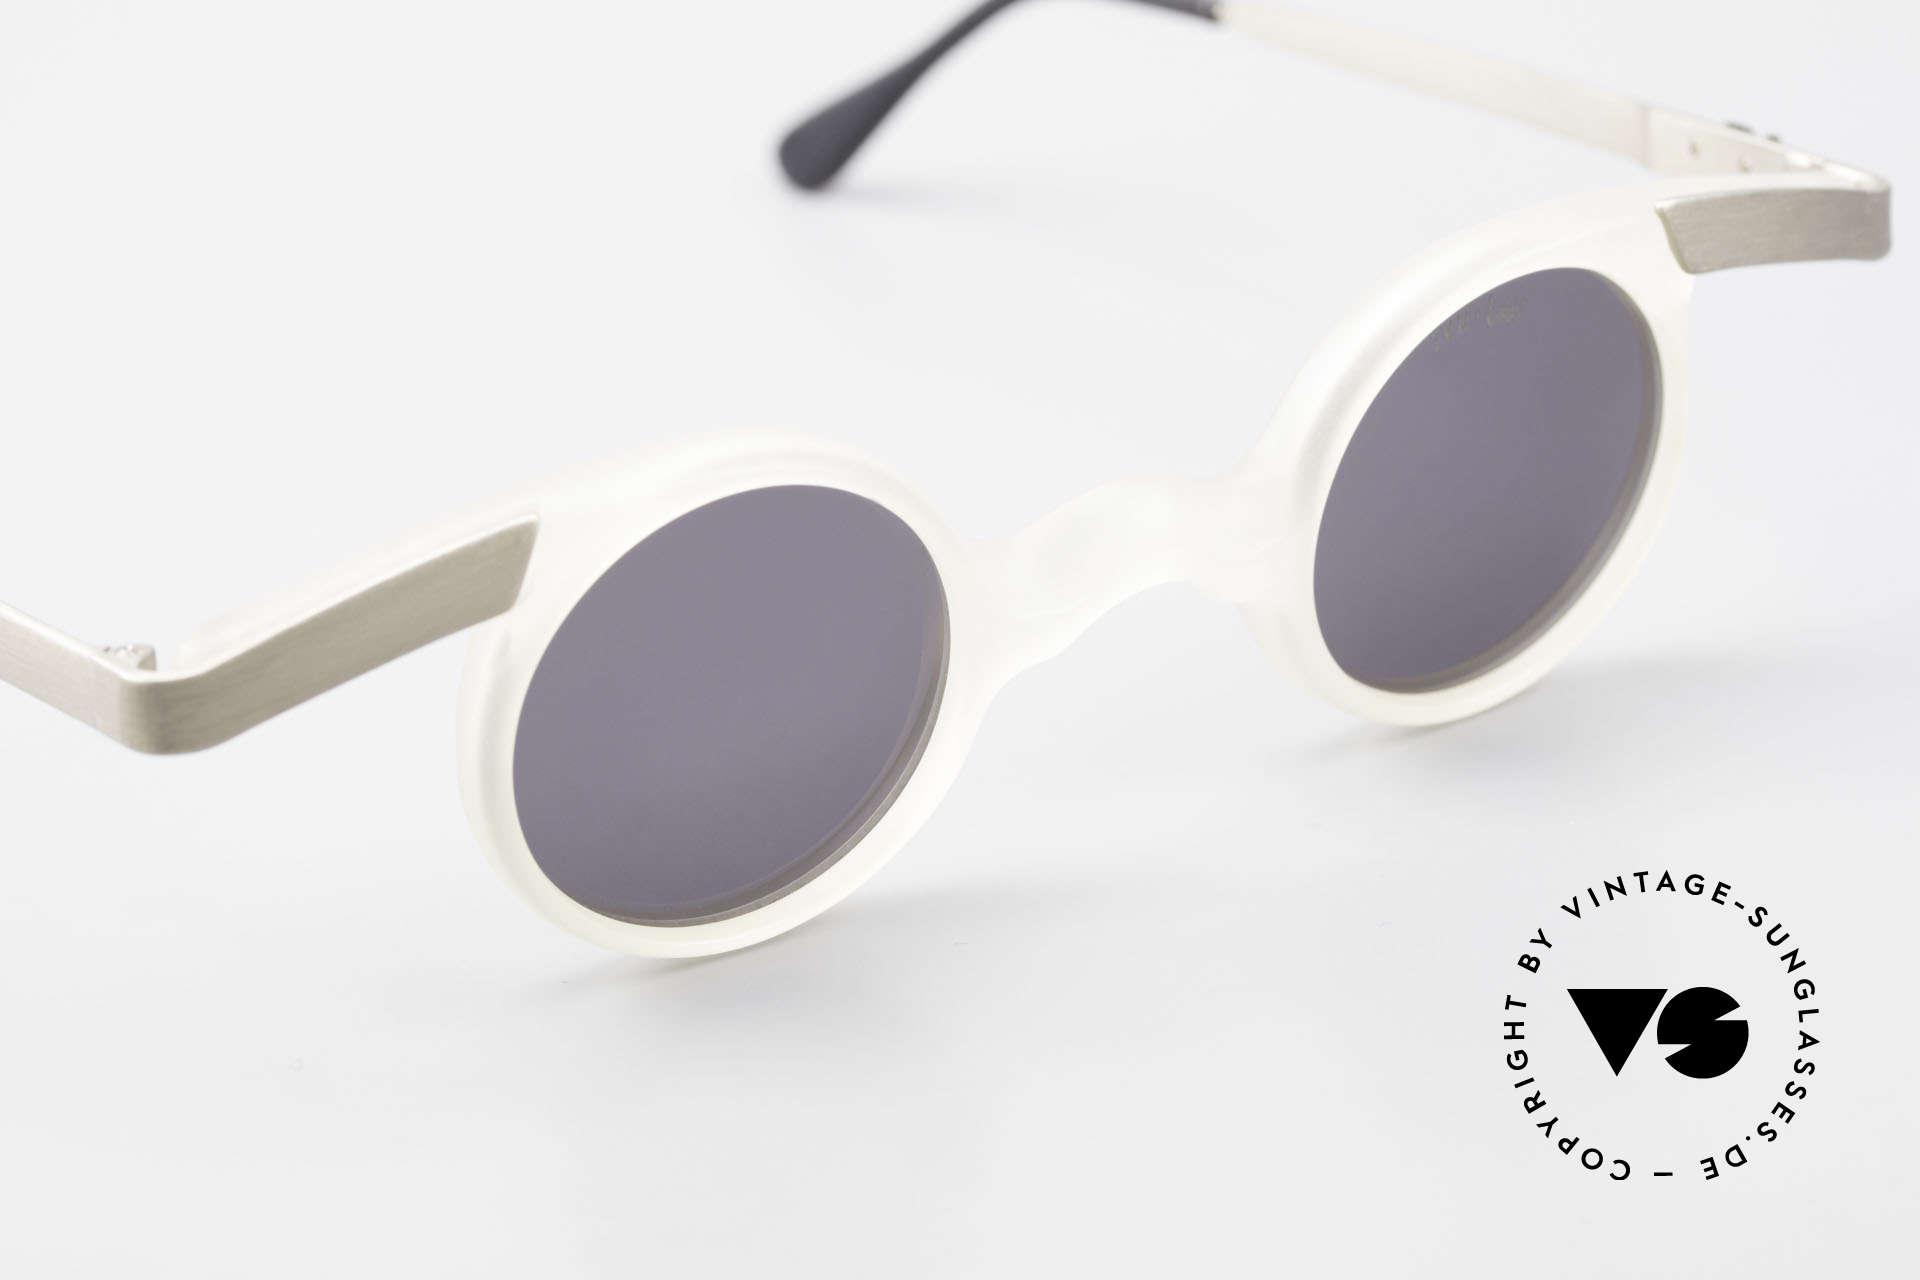 Sunboy SB39 Vintage No Retro Sunglasses, Size: medium, Made for Men and Women